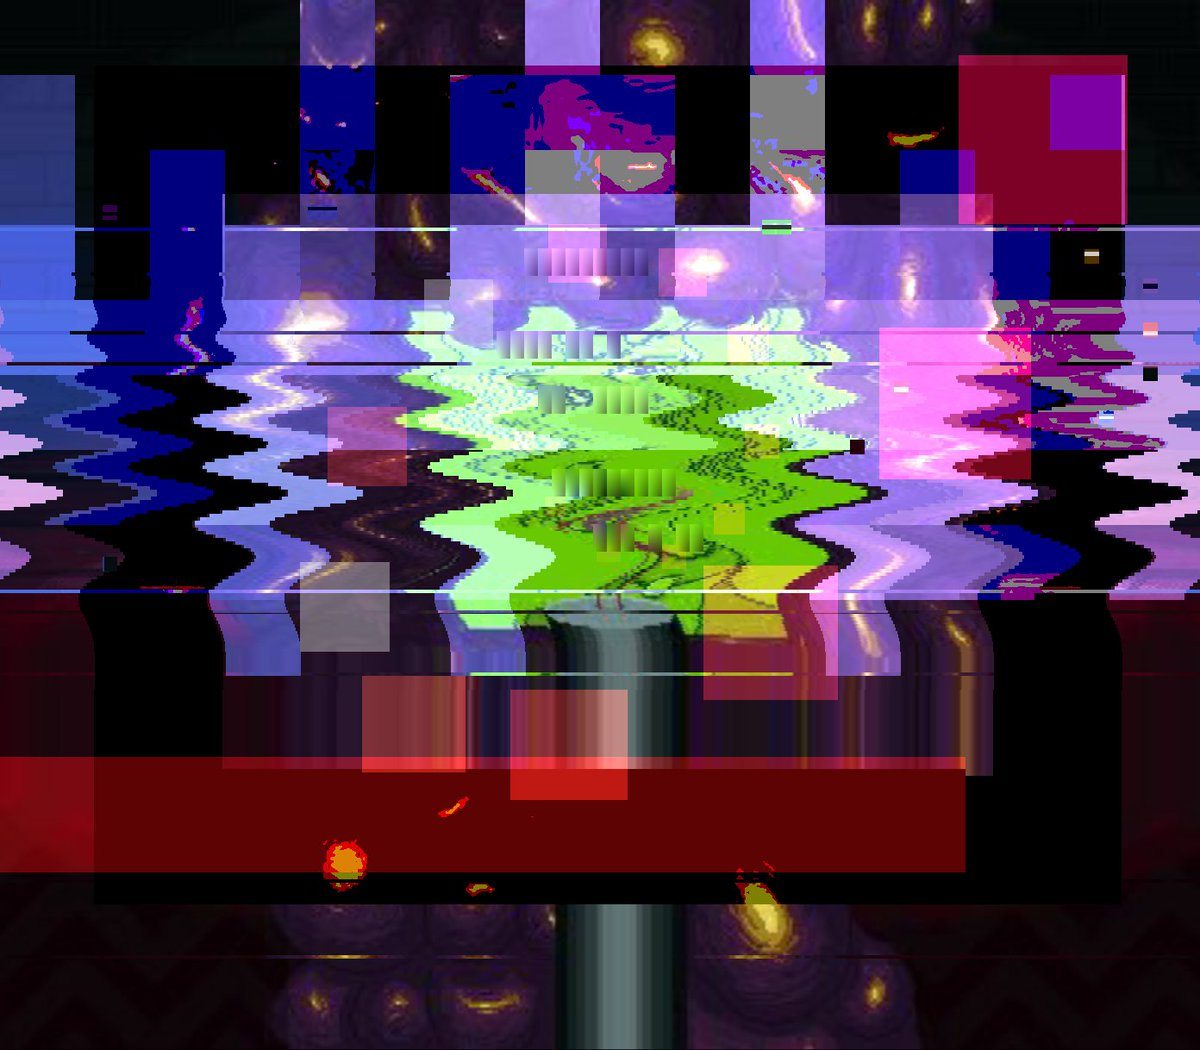 😁🎫 glitch pixelart indiedev animation nodejs geometricart bot rosace Origin img by @weaboosdream